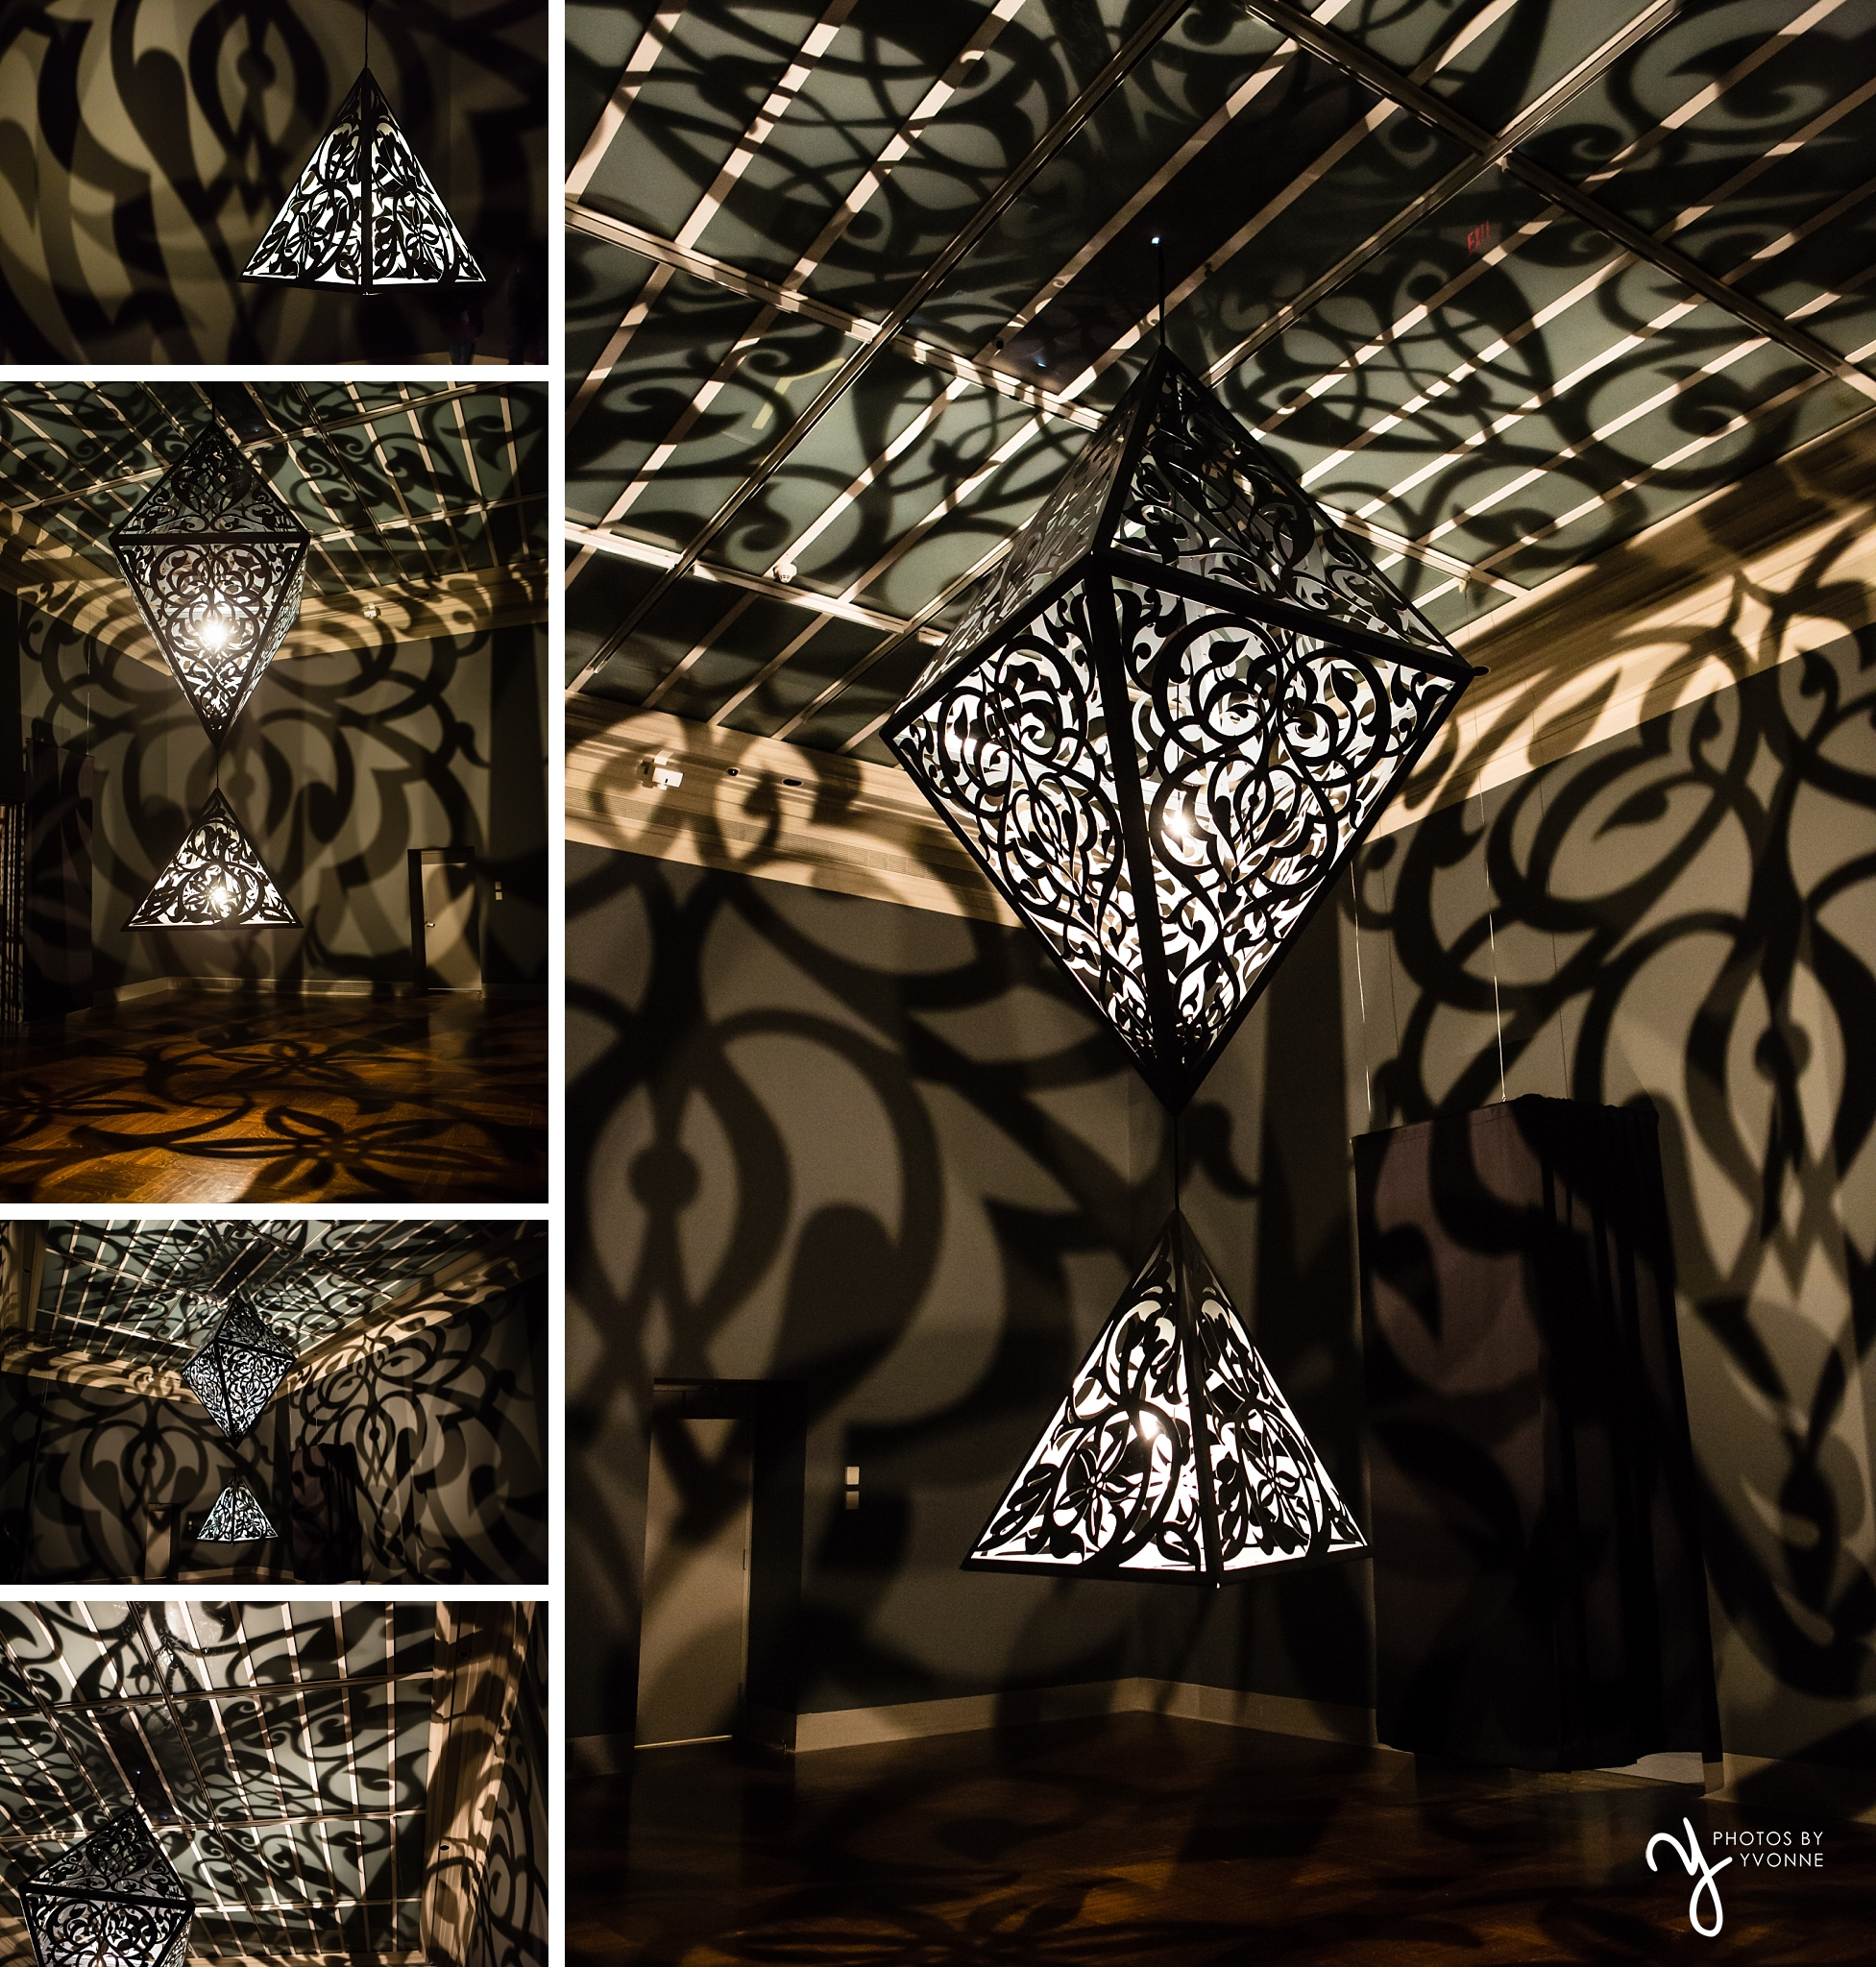 Anila Quayyam Agha: Between Light & Shadow exhibit